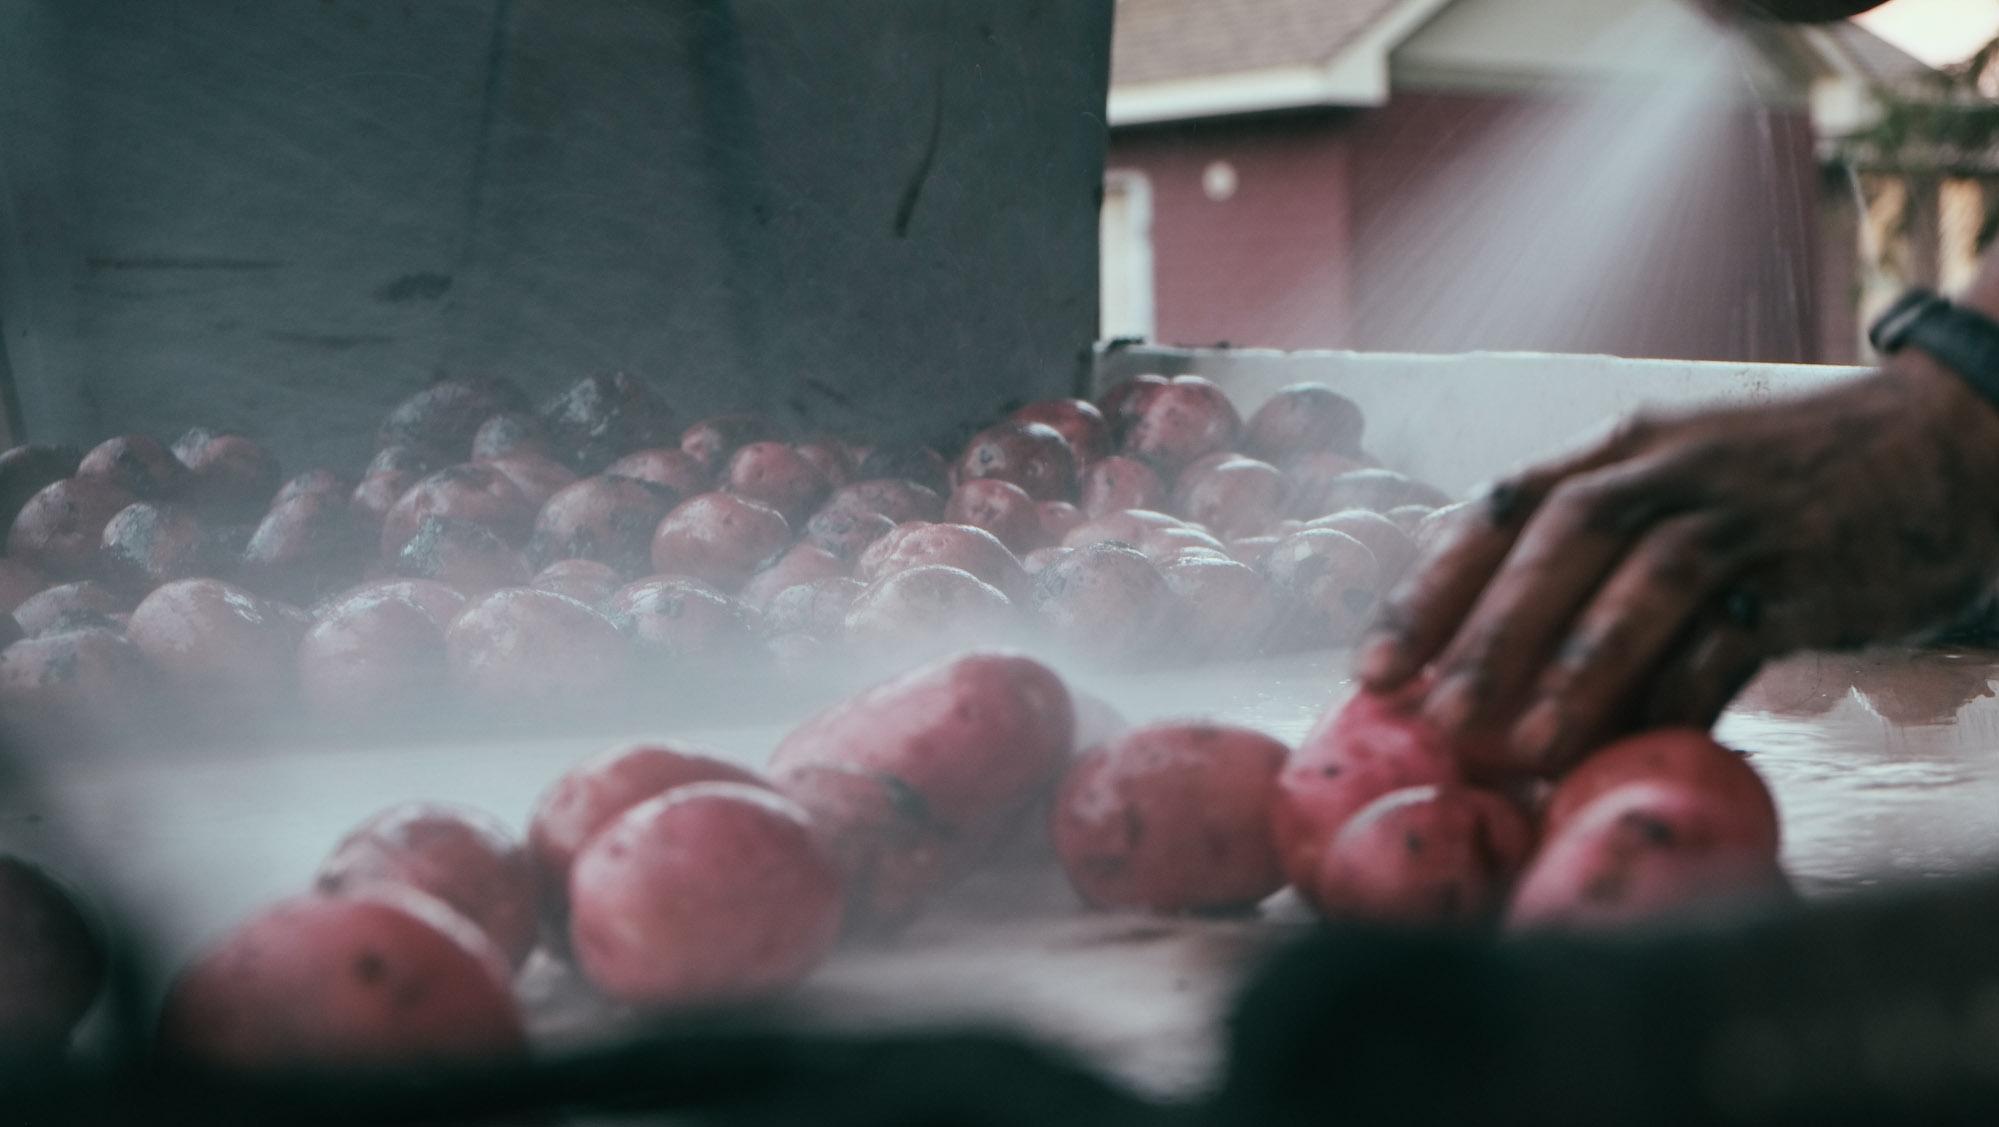 Washing Potatoes